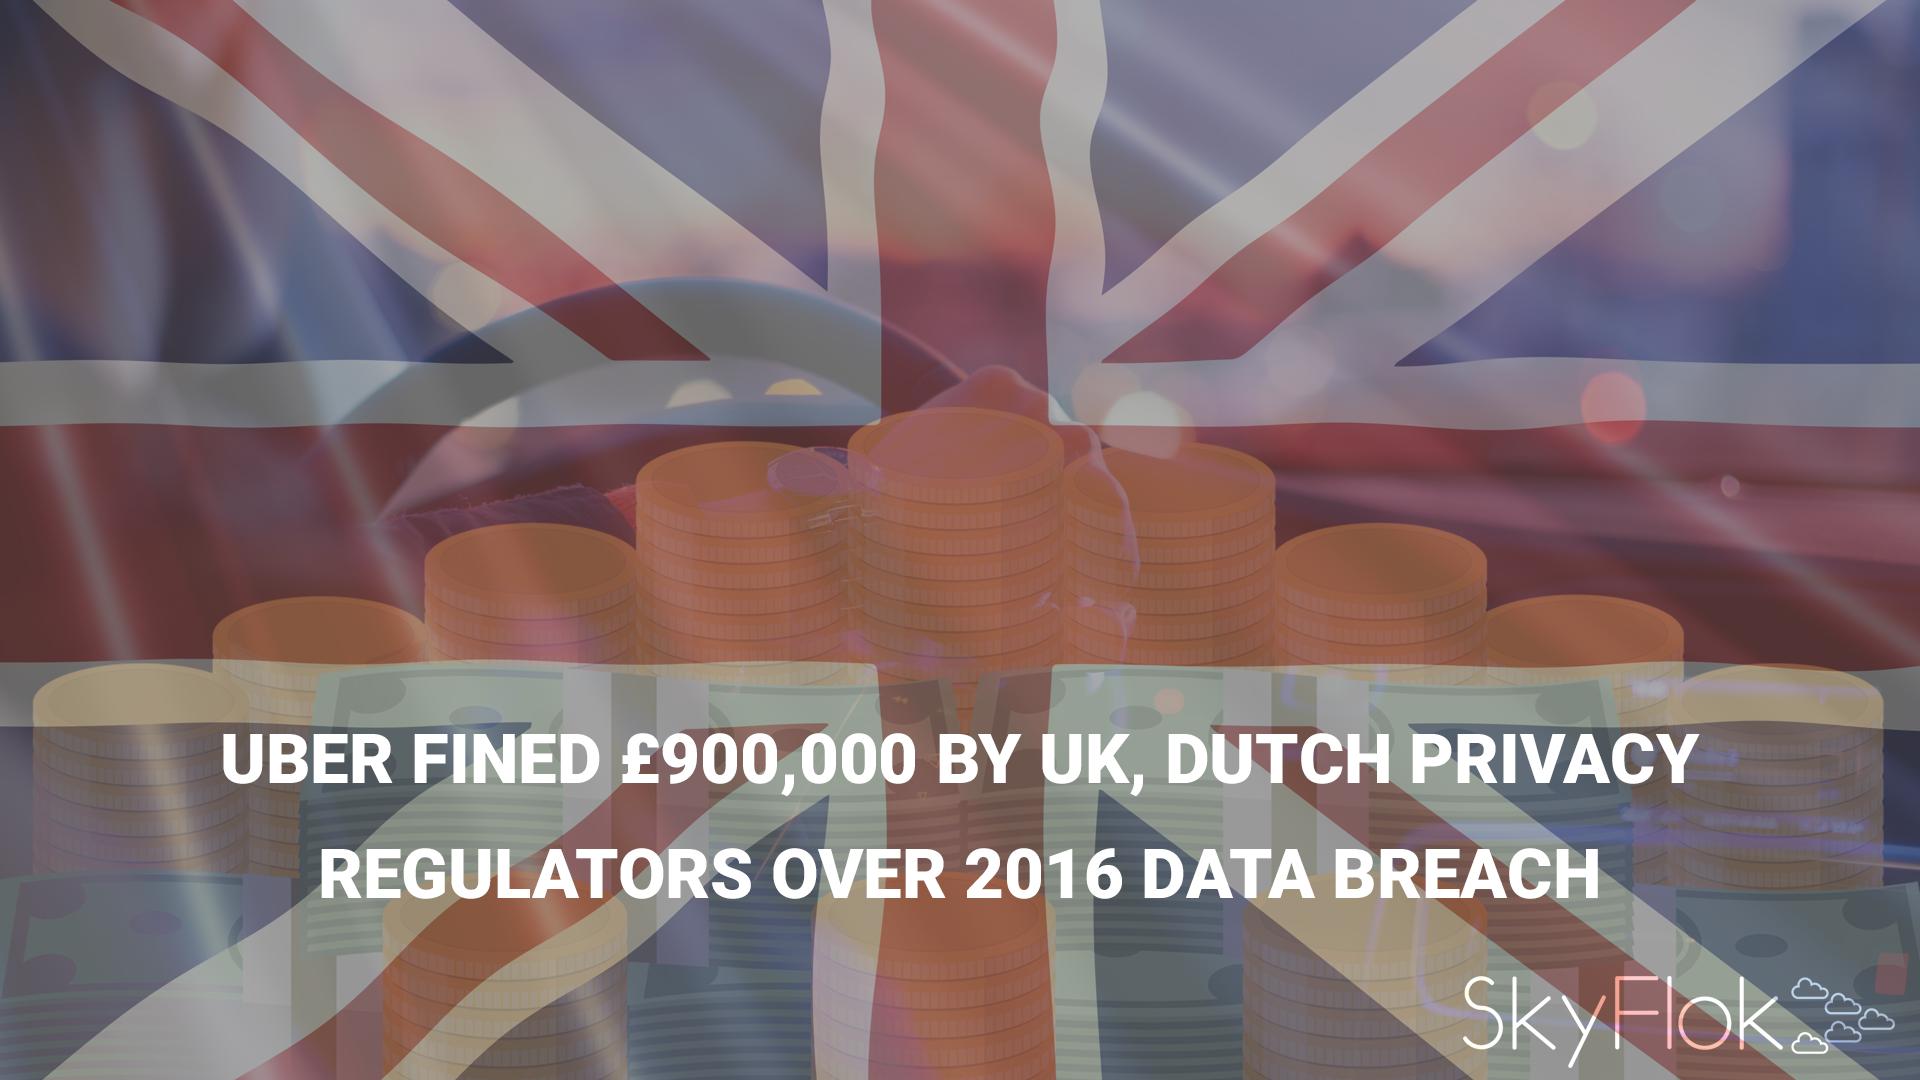 Uber fined £900,000 by UK, Dutch privacy regulators over 2016 data breach